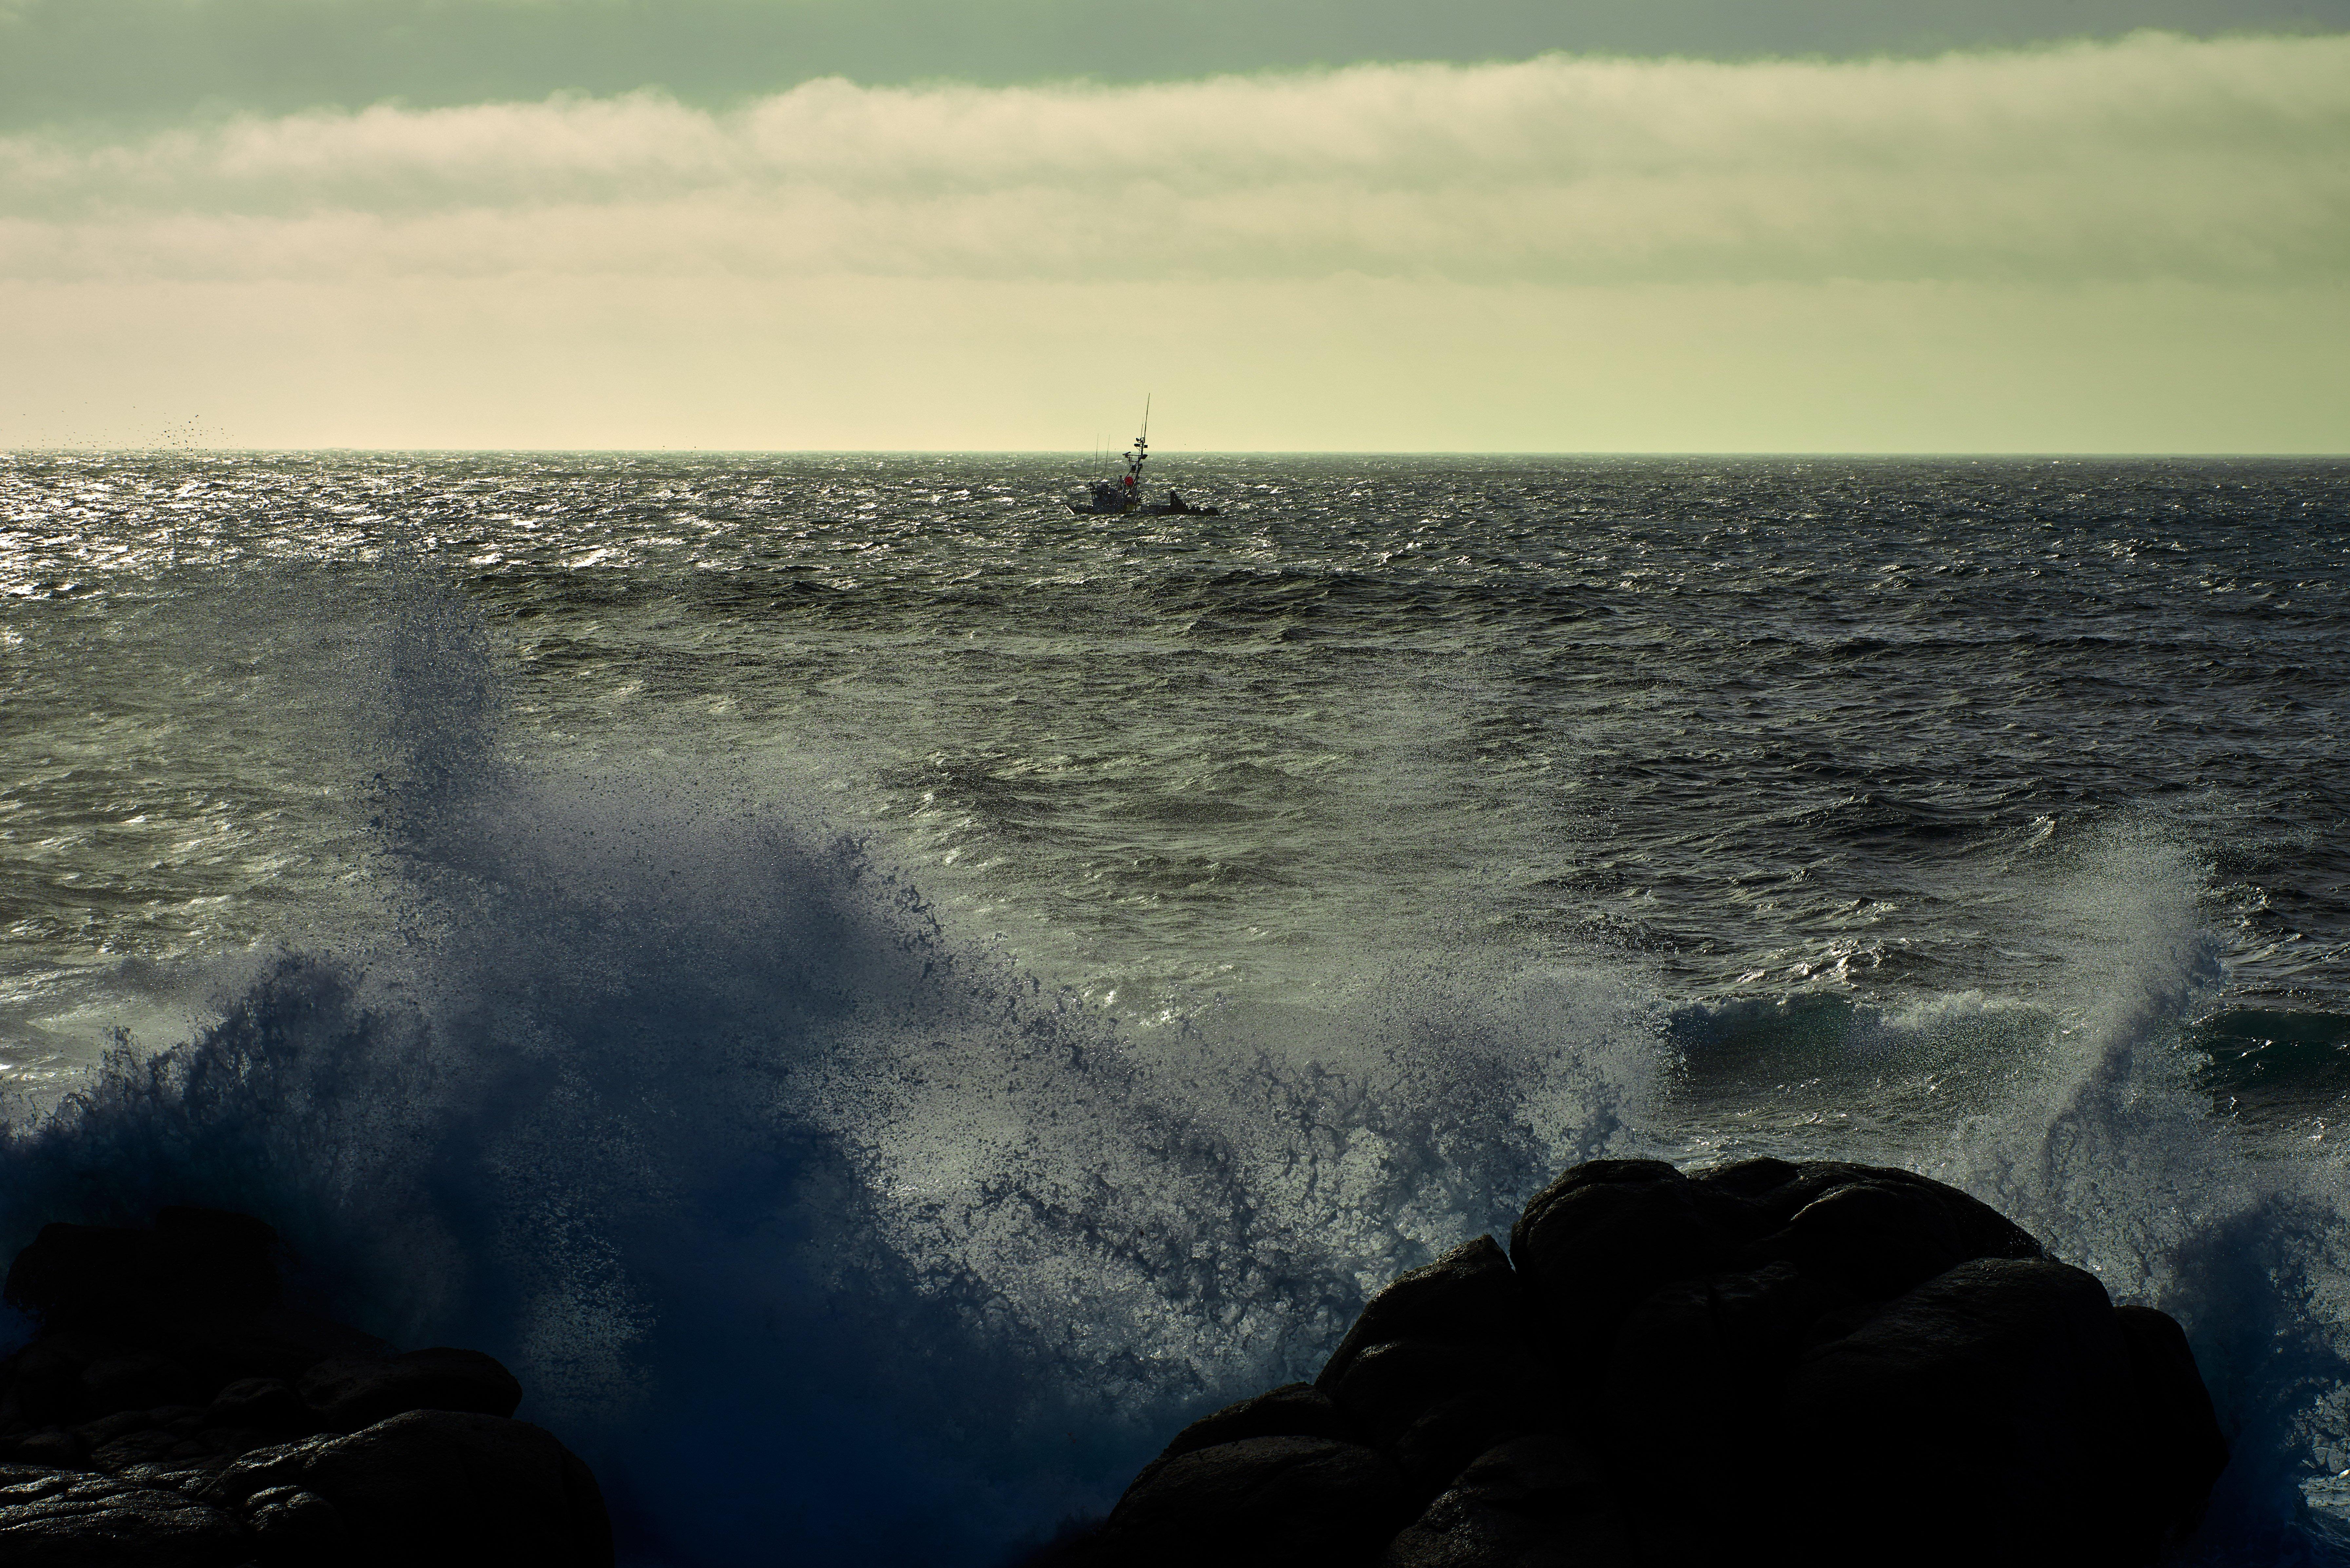 Muxia - A Coruña